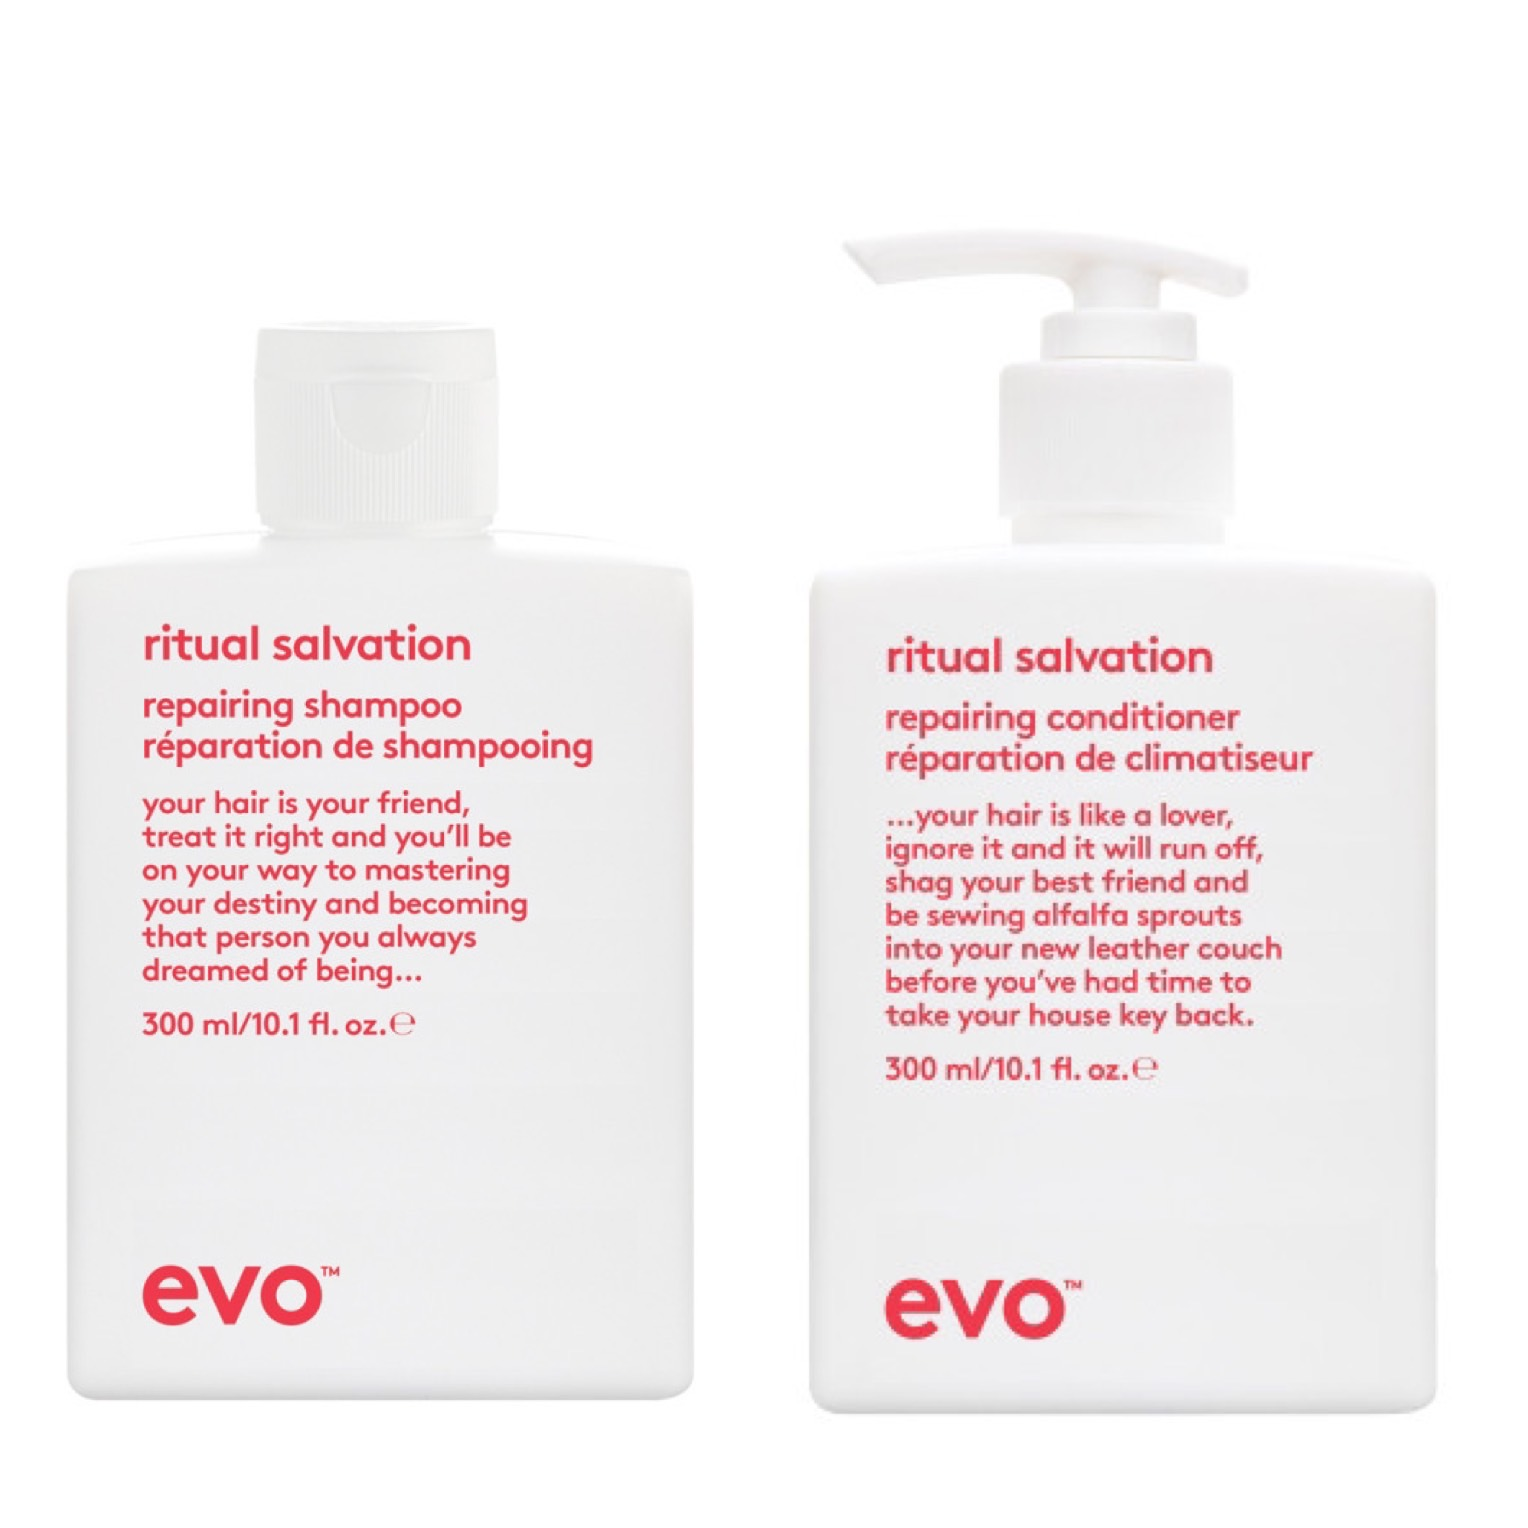 Evo Ritual Salvation Repairing Shampoo 300 ml + Conditioner 300 ml